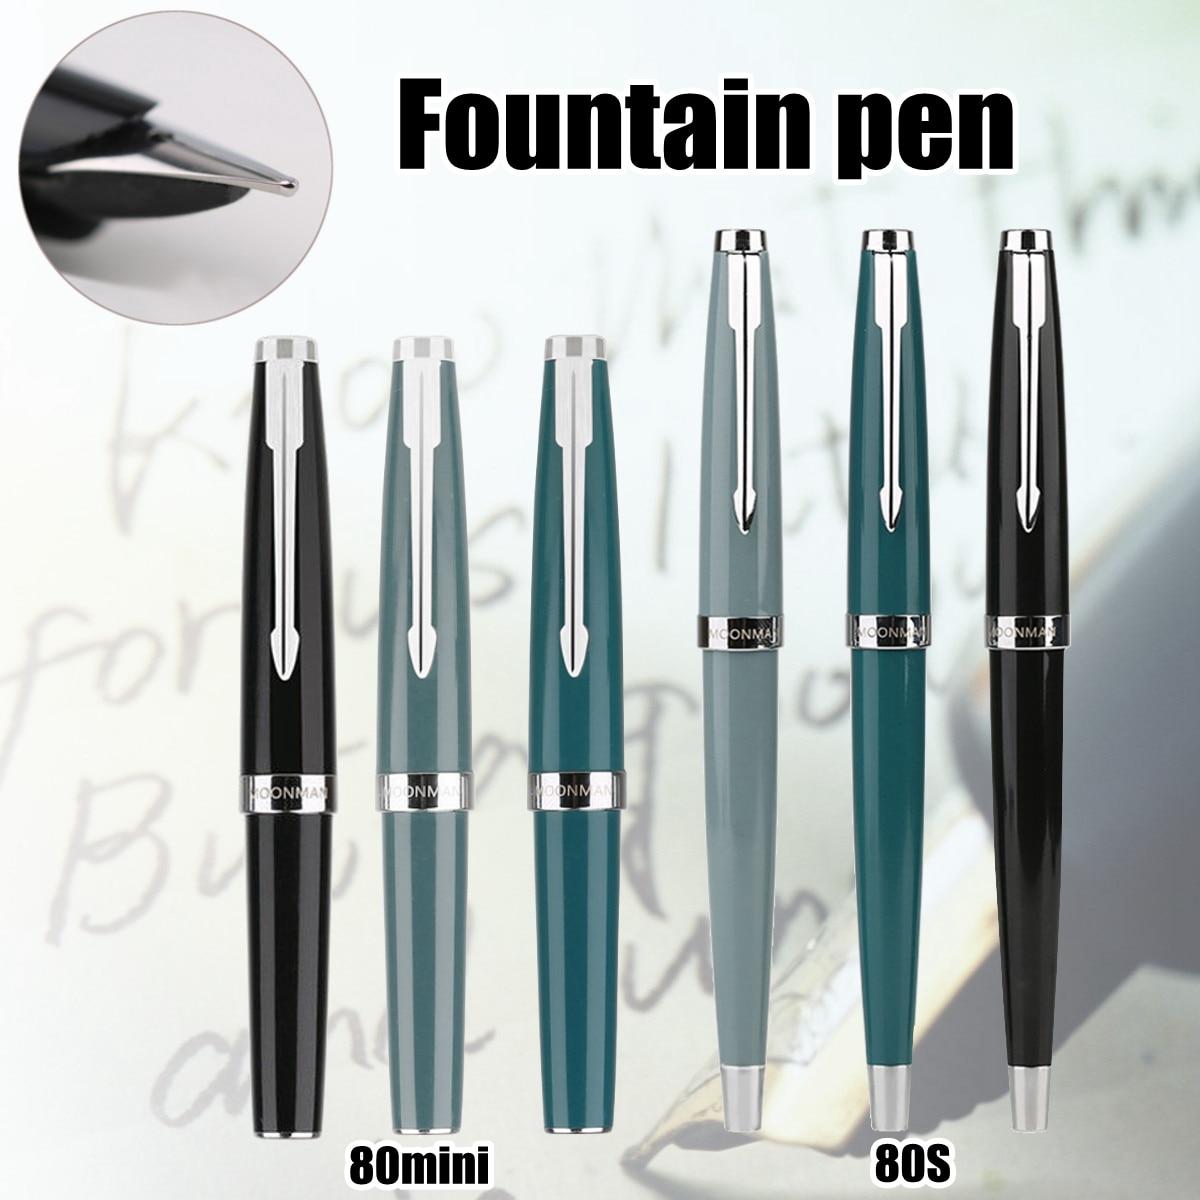 MOONMAN 80s 80 MINI P ocket Fountain Pen Fine Nib Find Classic Series Pen Fountain Pen genium hero 100 pen total steeless 14k golden fine nib fountain pen